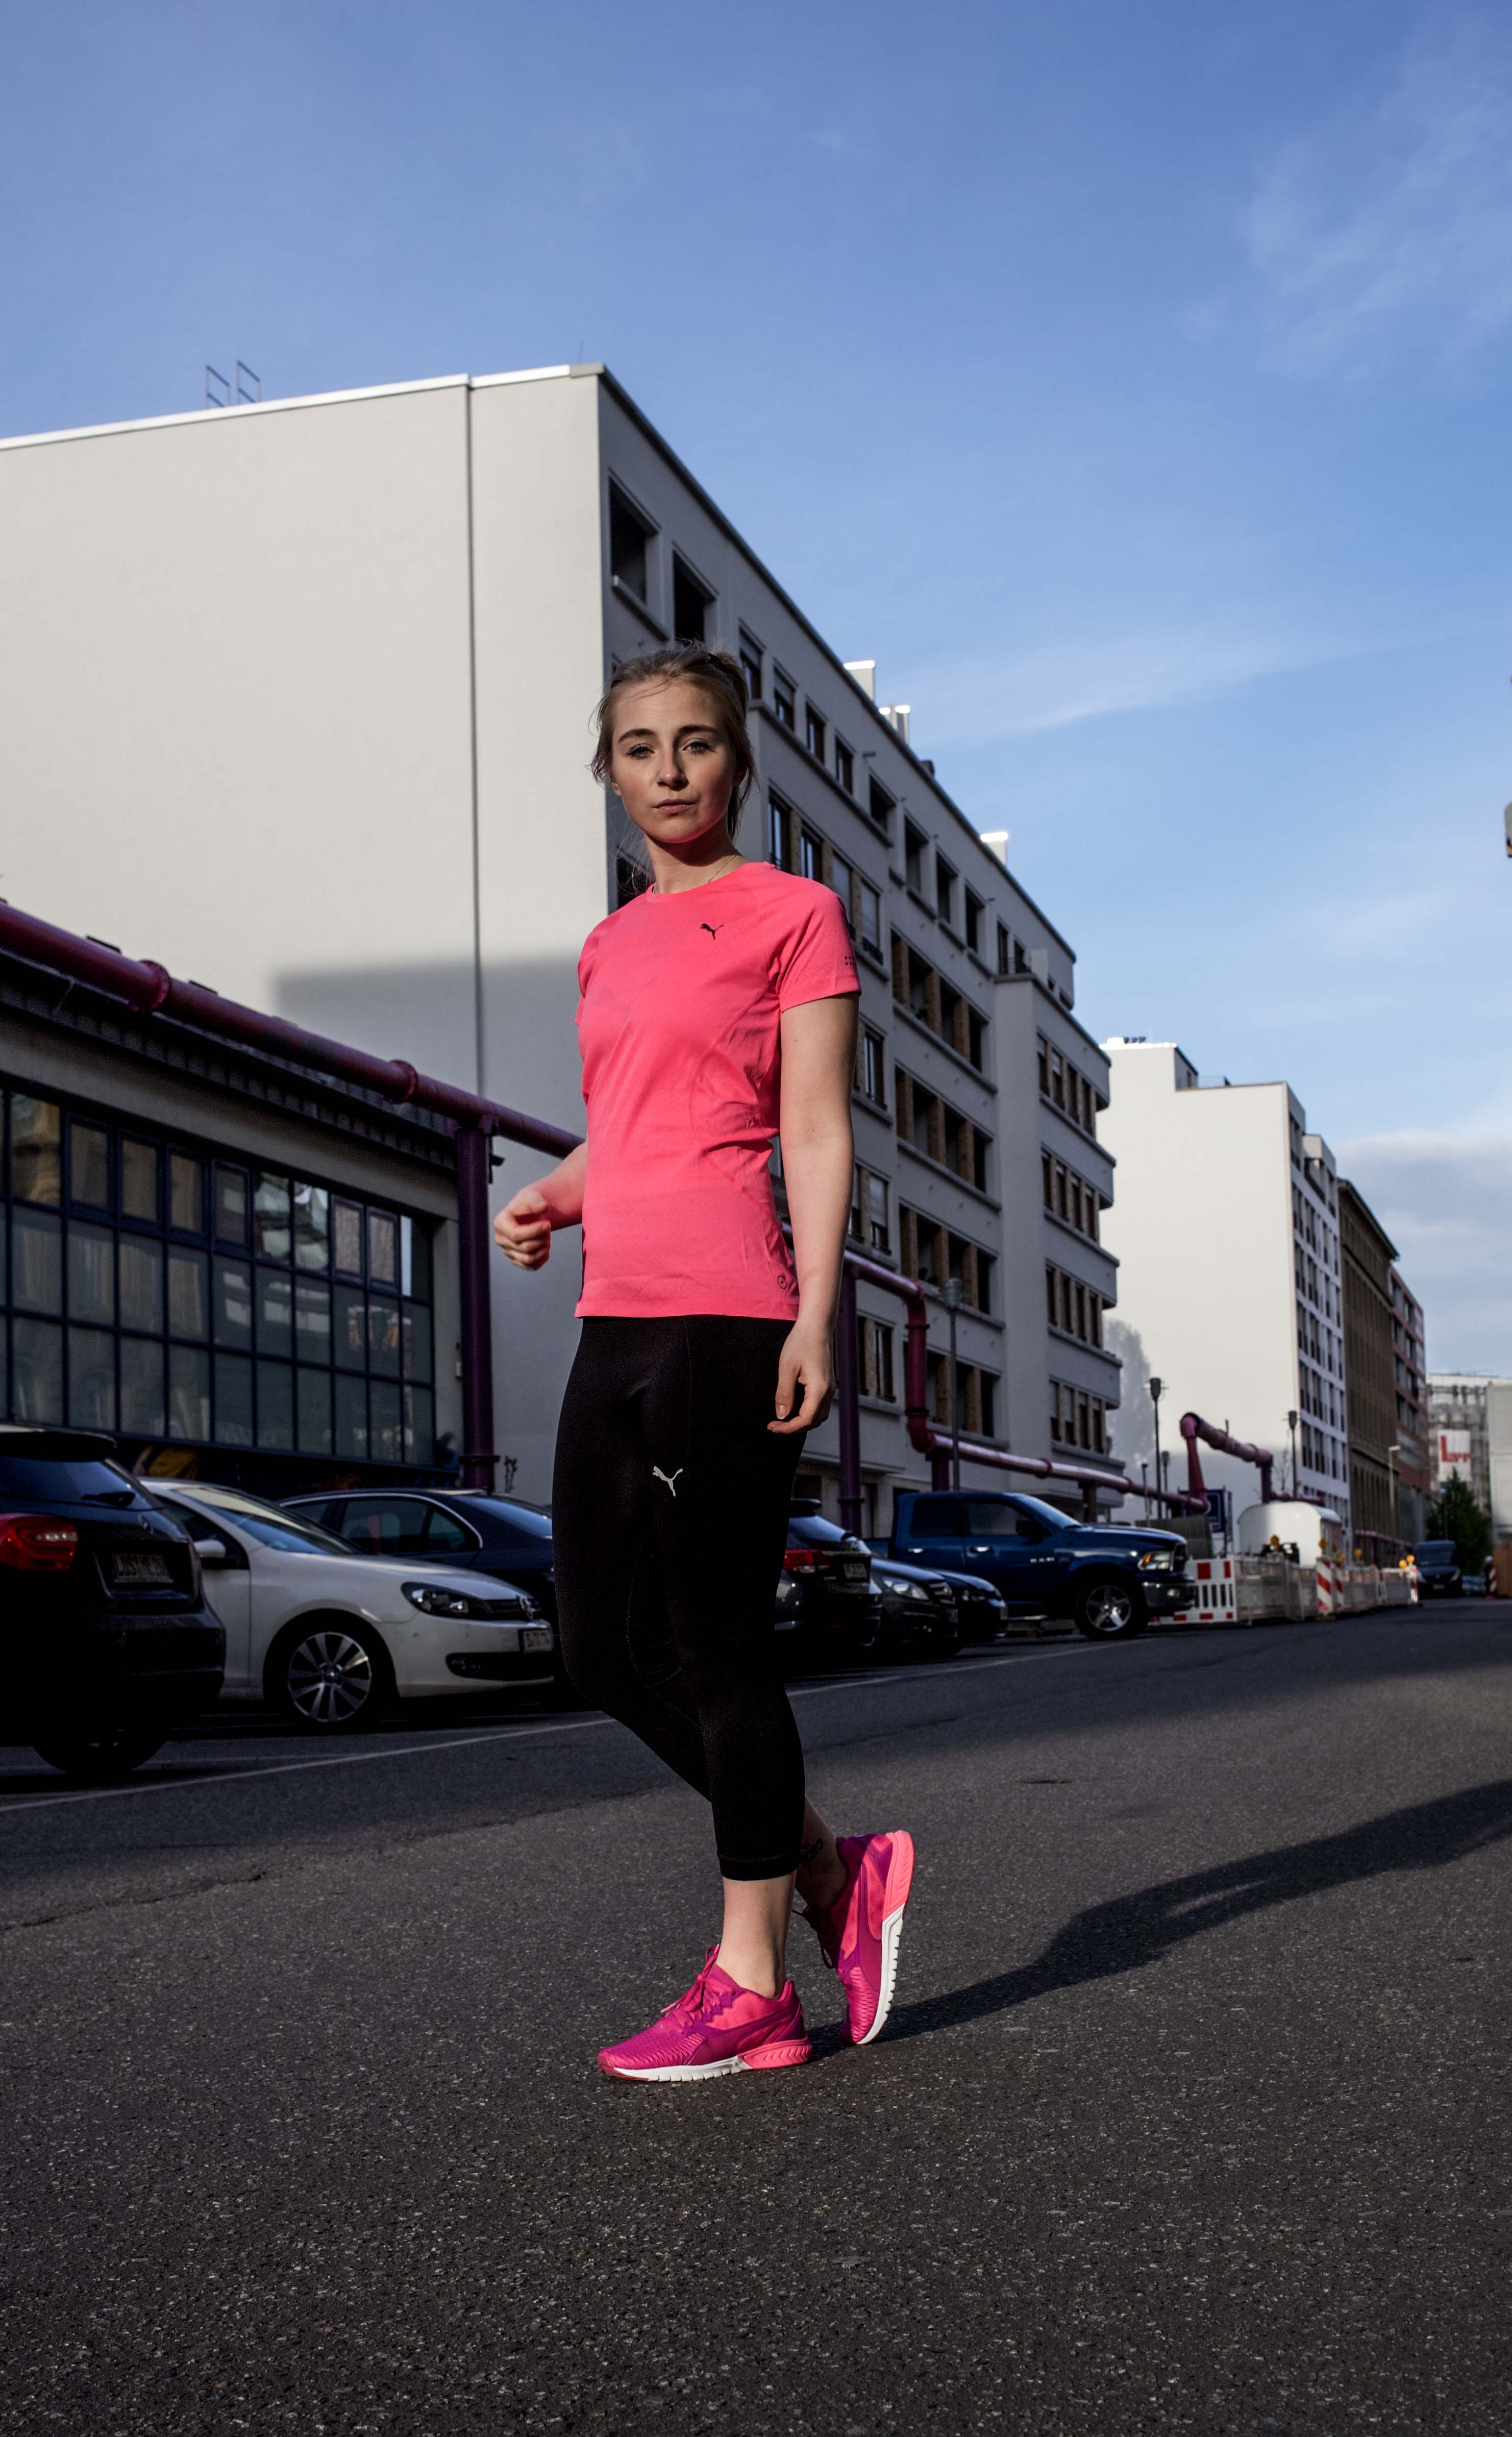 puma-lauf-outfit-laufen-tipps-joggen-mode-fitness-gym-workout-sport_8396